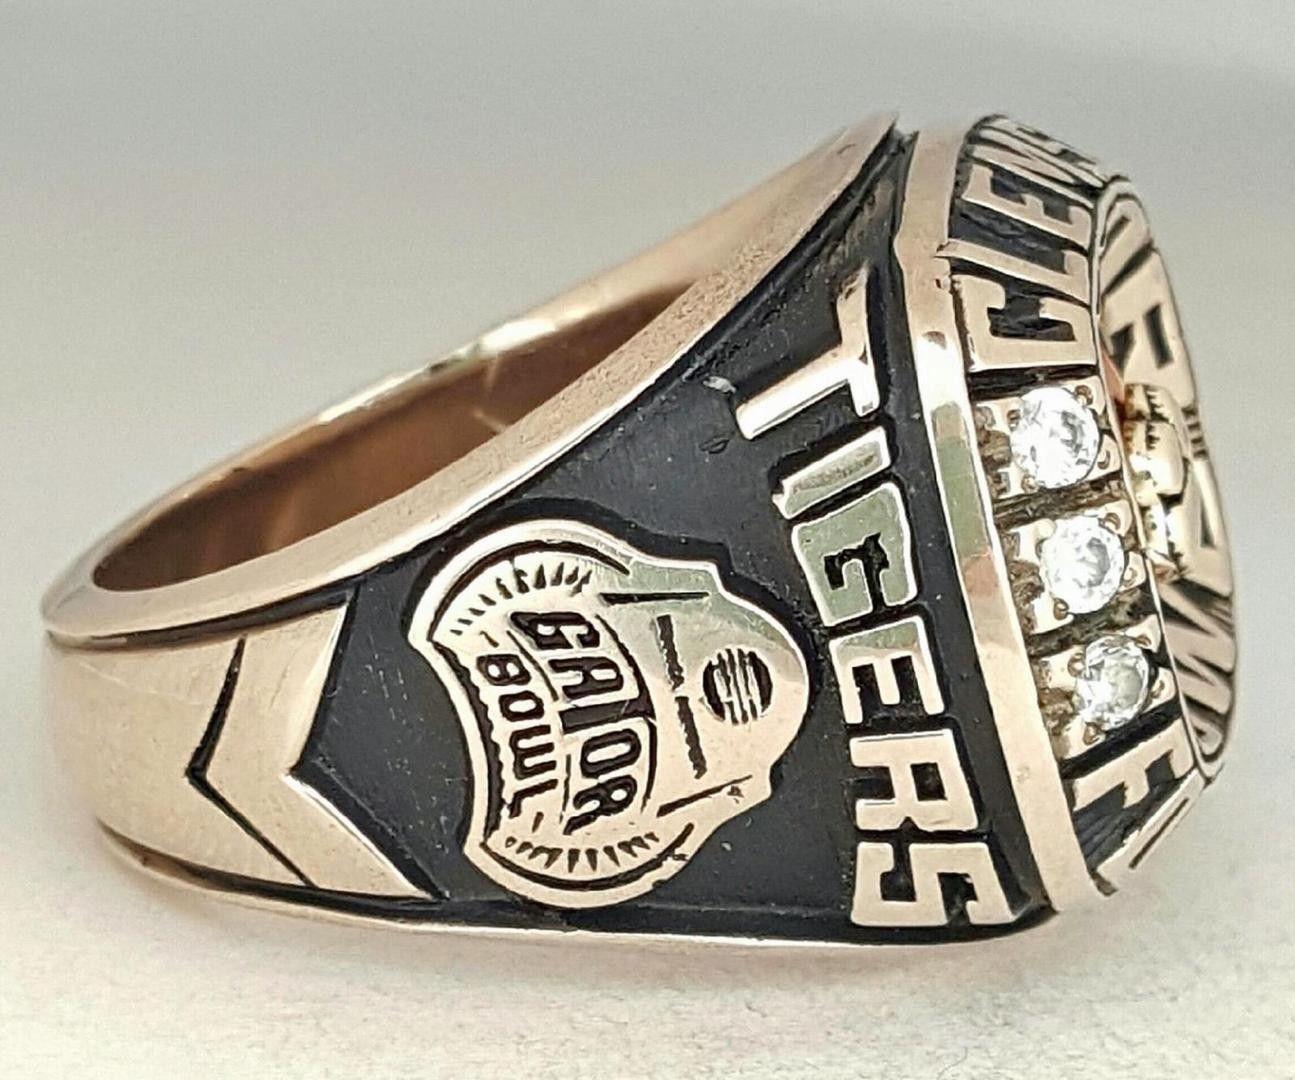 2008 Clemson Tigers Acc Gator Bowl Football Championship Ring Gator Bowl Clemson Tigers Championship Rings